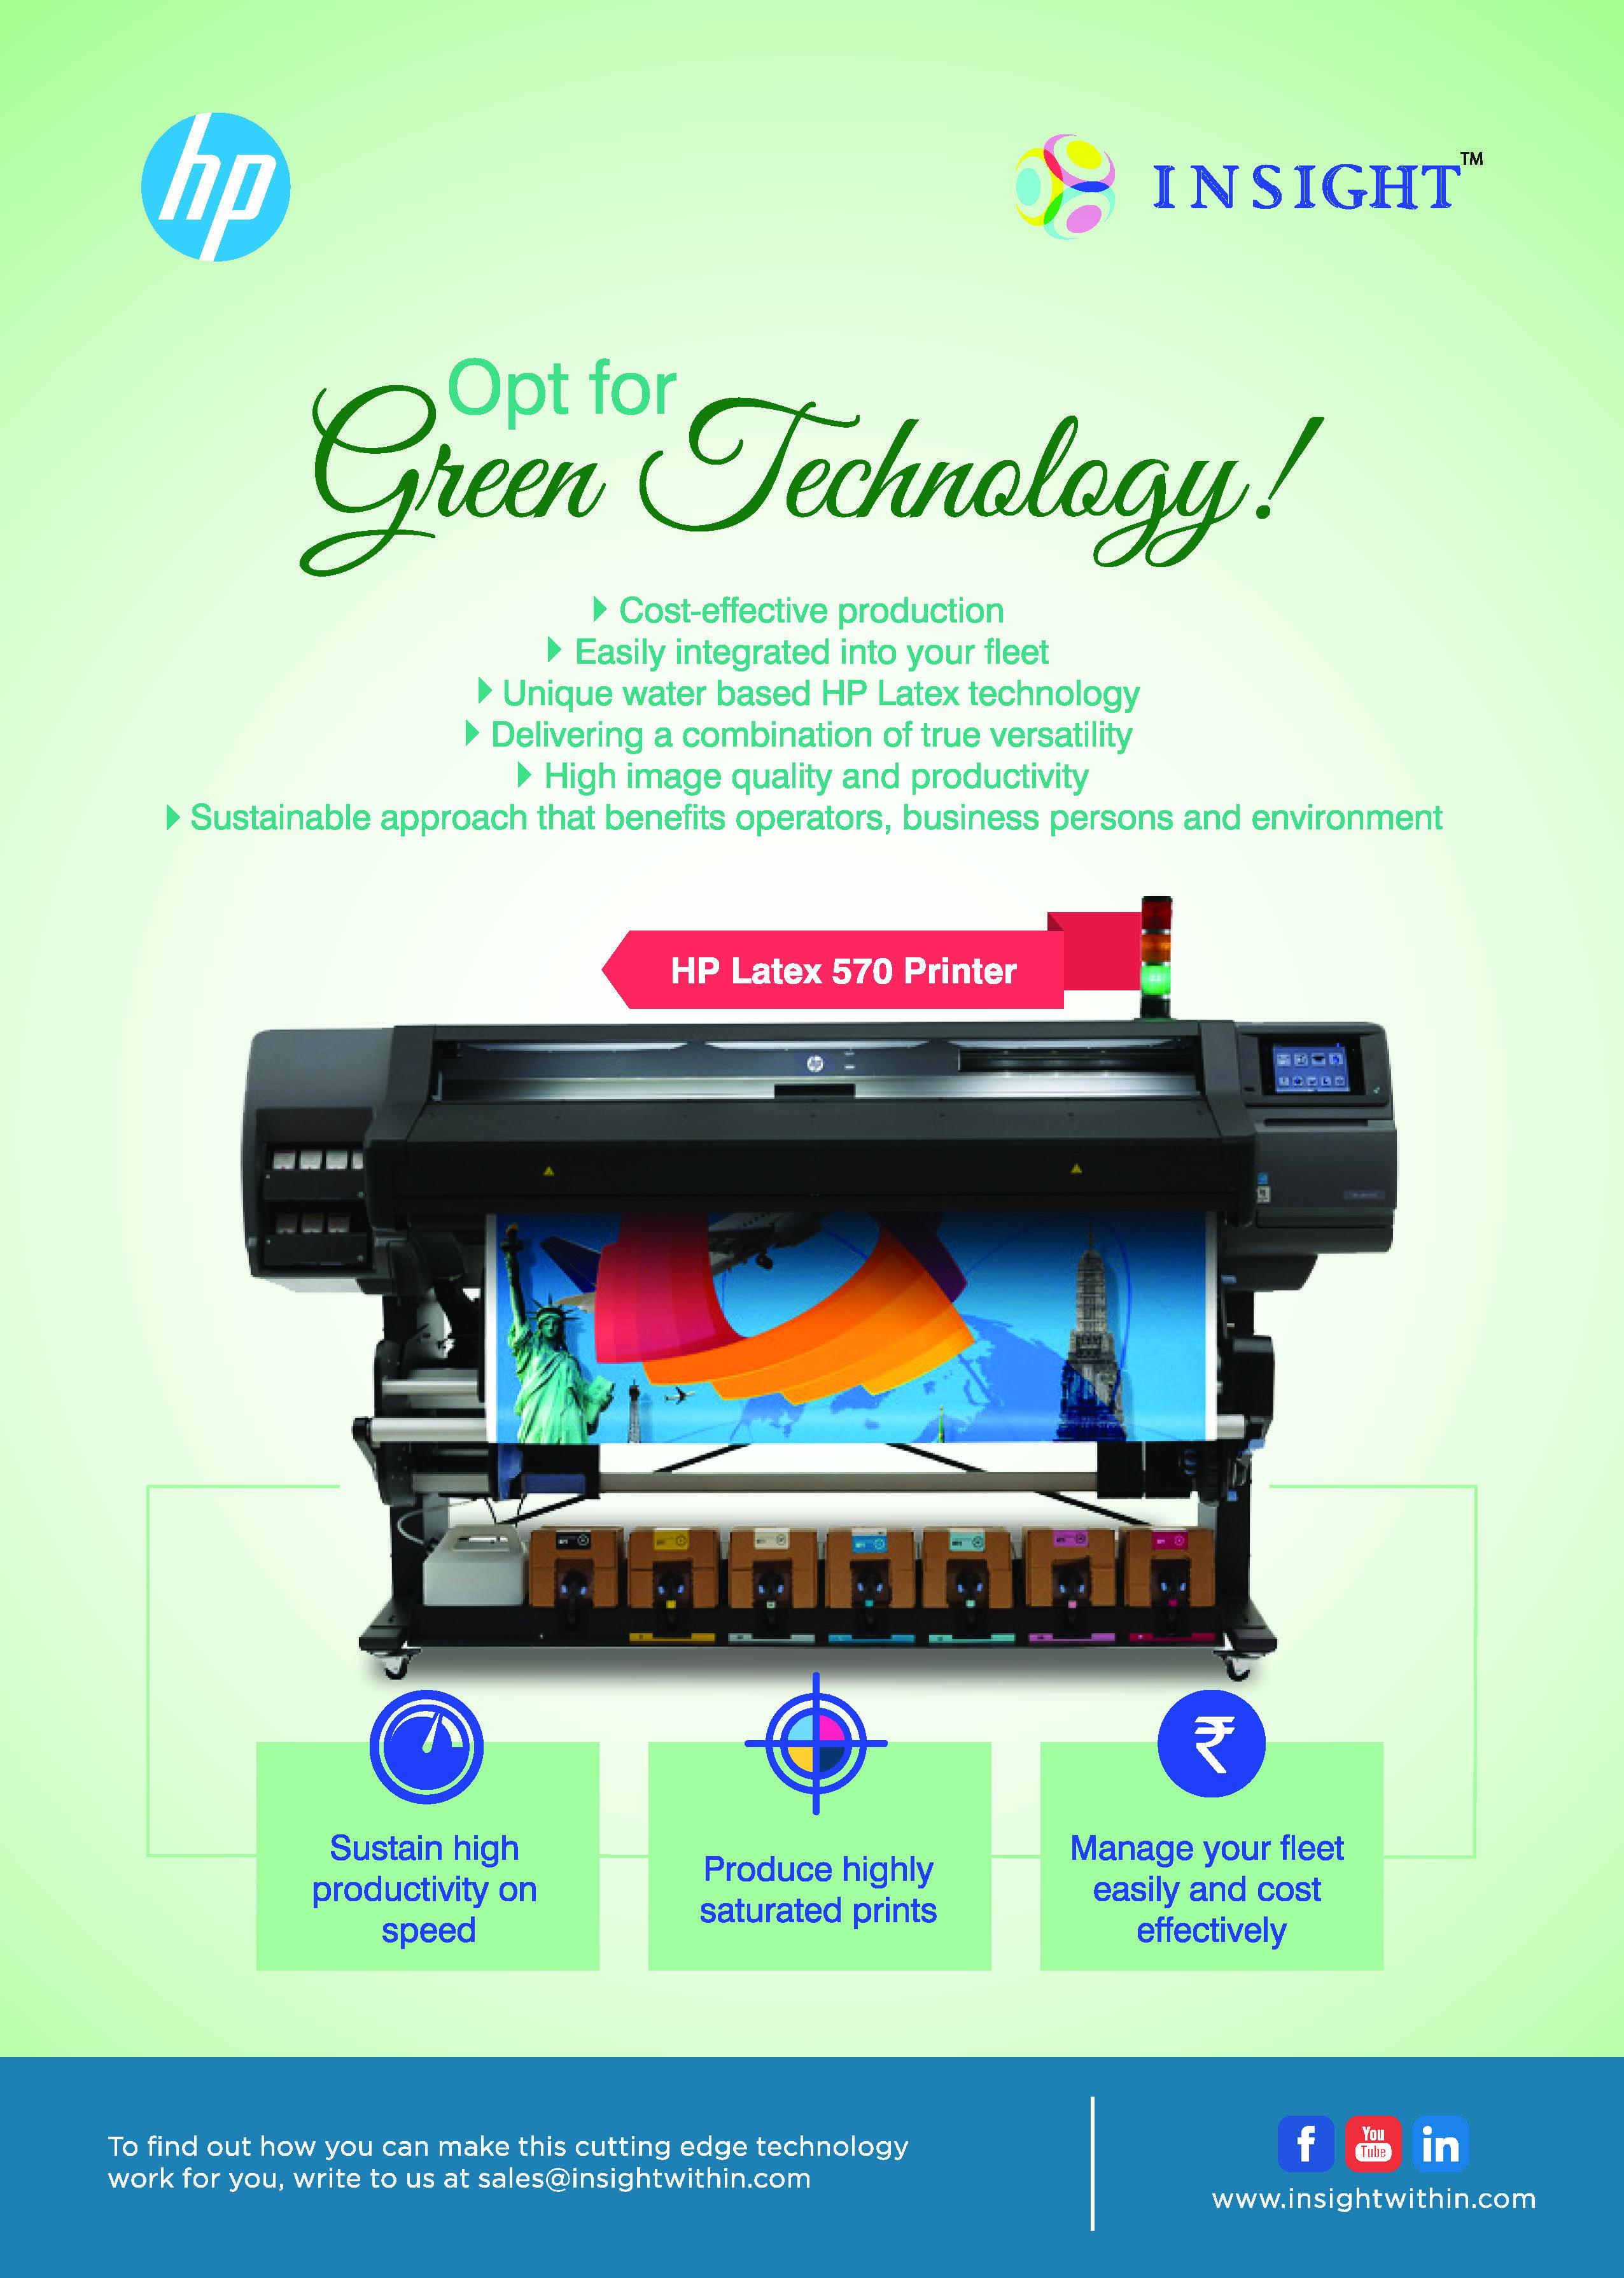 Pin By Insight Print Communications On Hp Printers Green Technology Hp Printer Insight